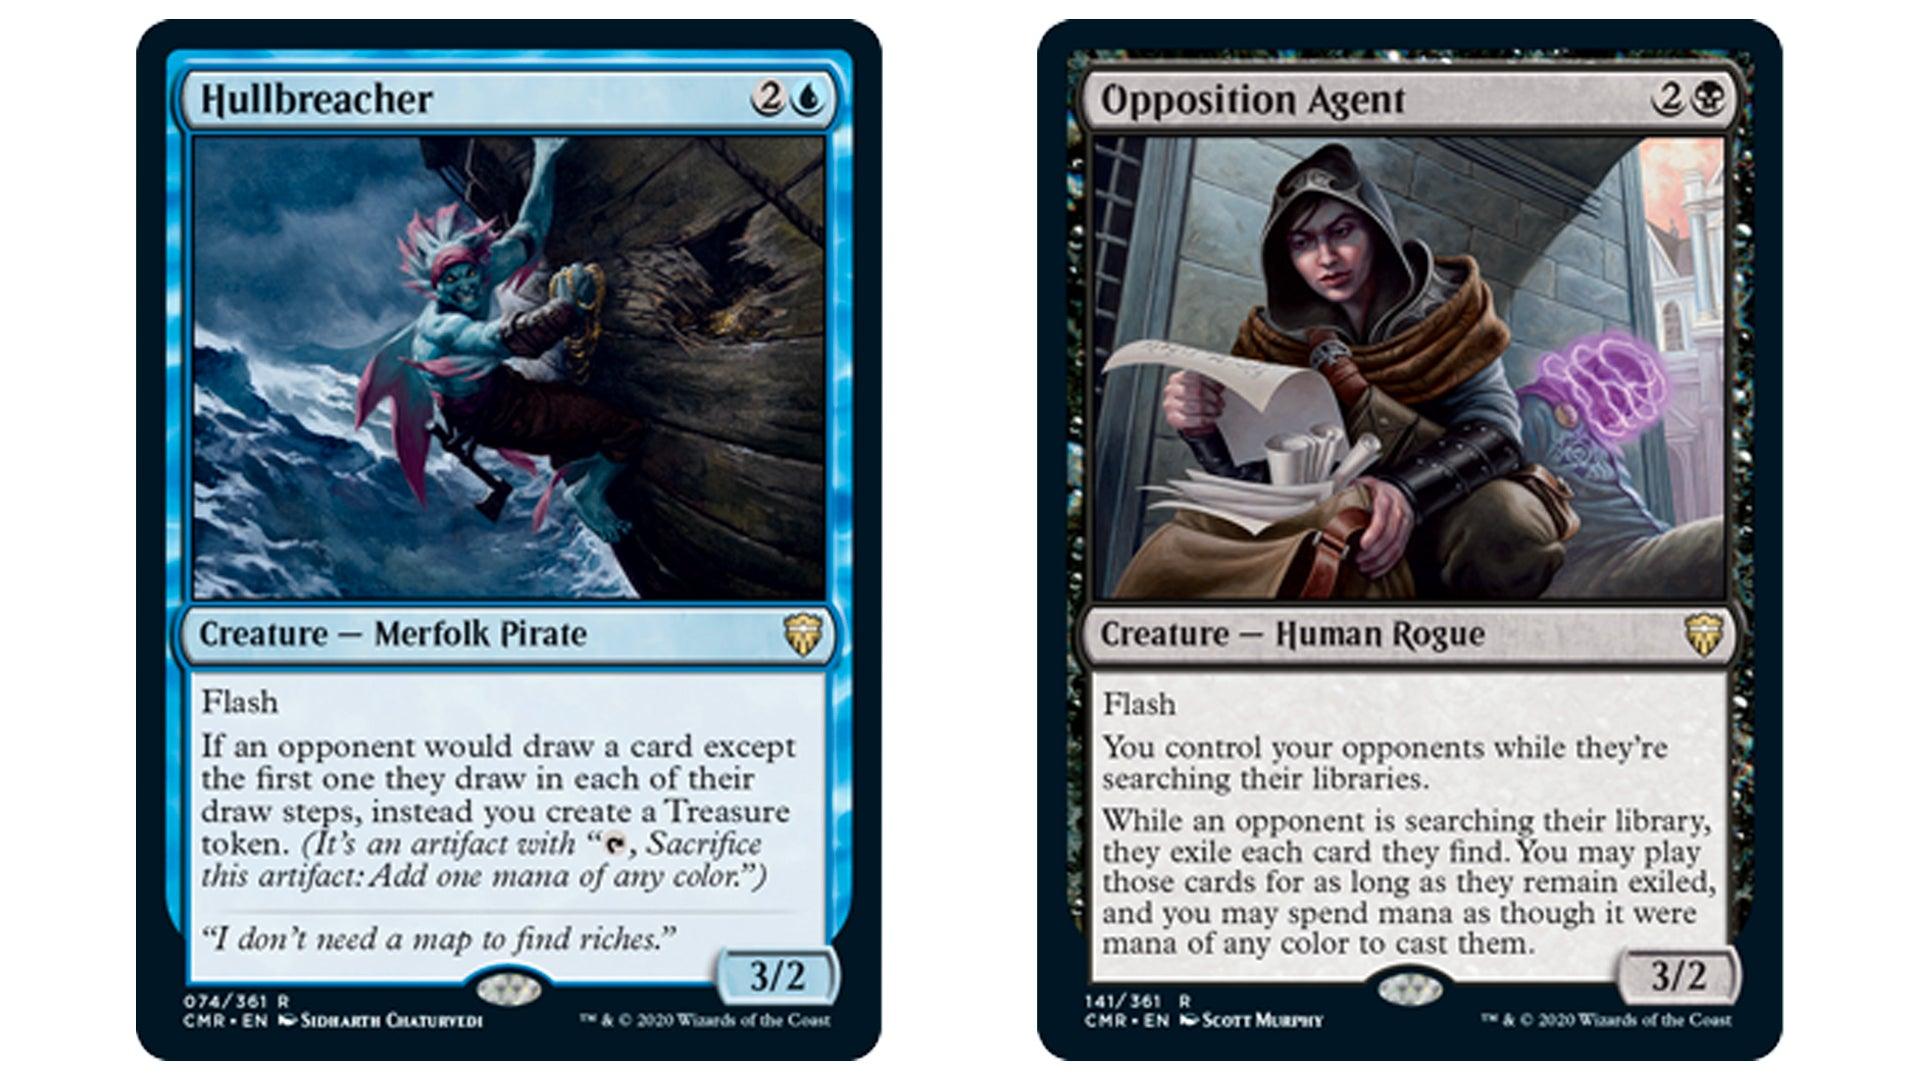 mtg-commander-legends-hullbreacher-opposition-agent-cards.jpg